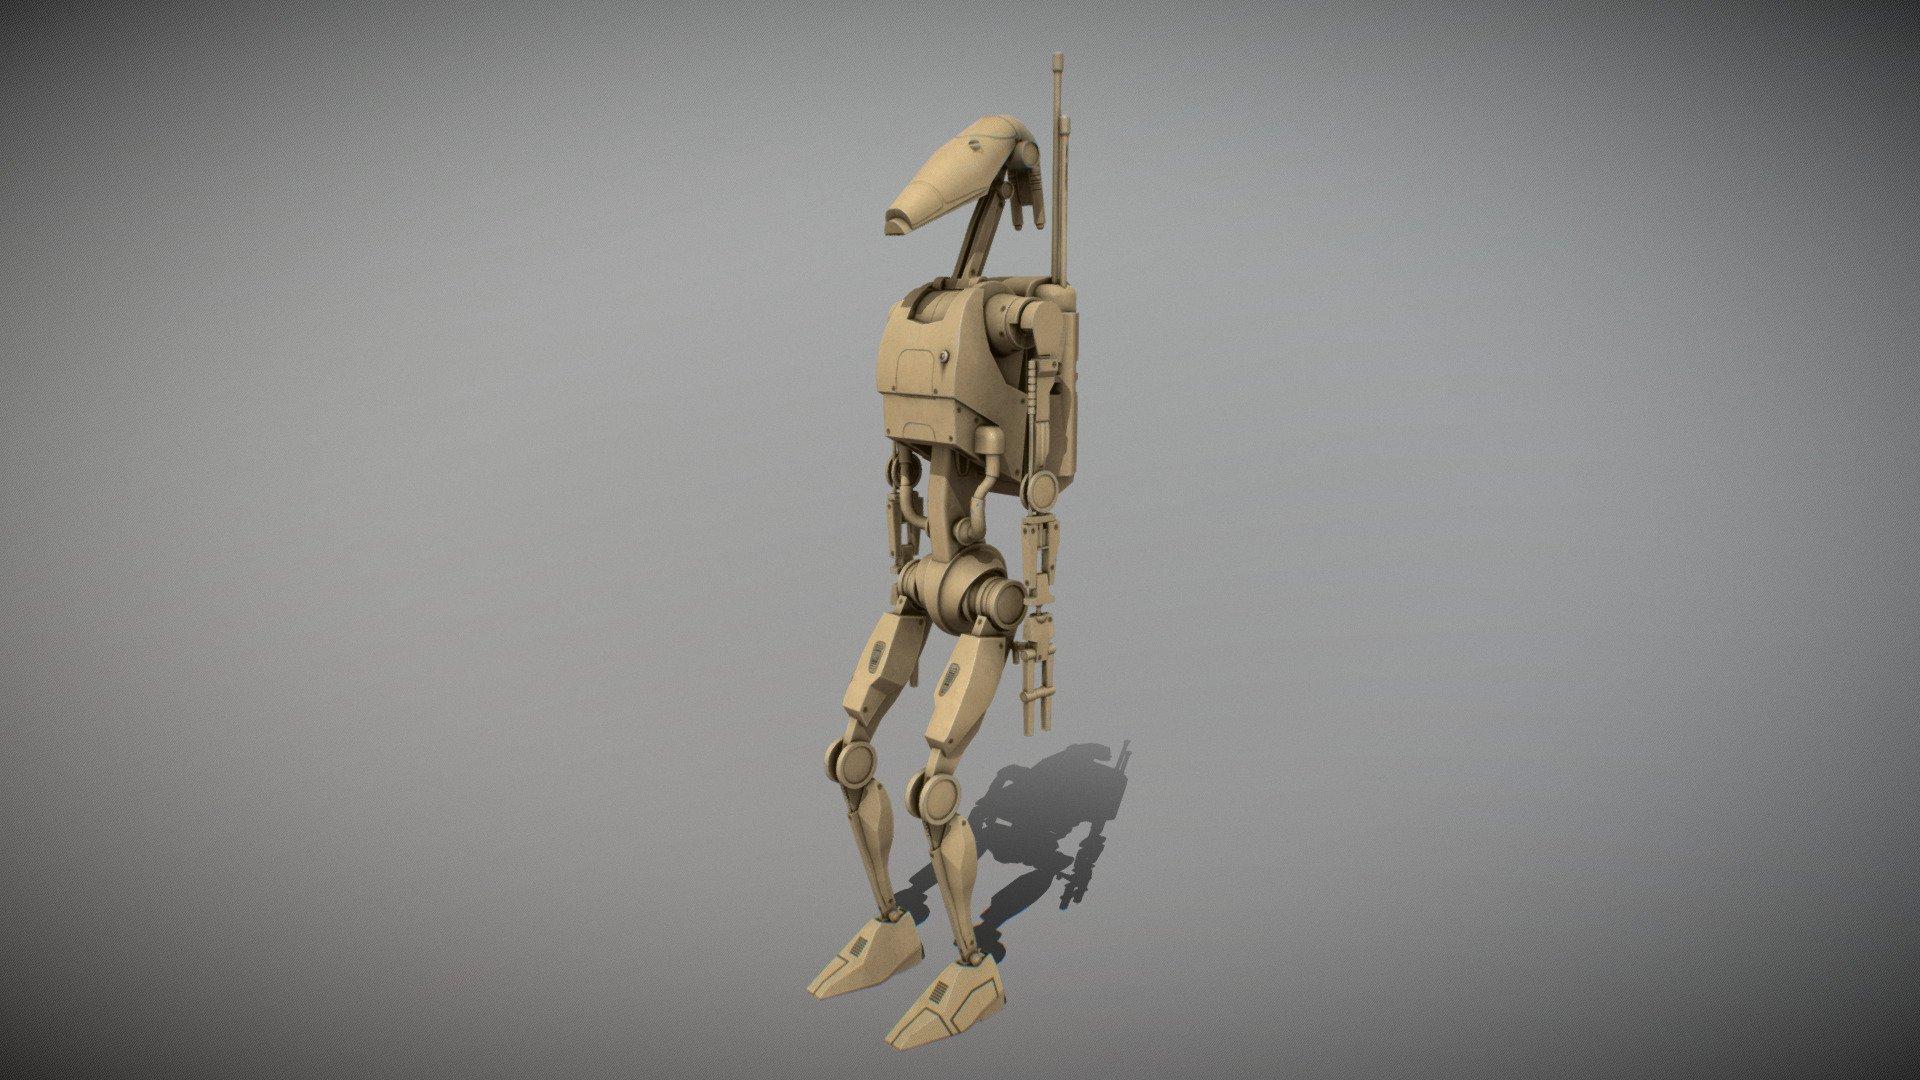 Star Wars B1 Battle Droid Download Free 3d Model By Eknightger Eknightger D353133 Sketchfab